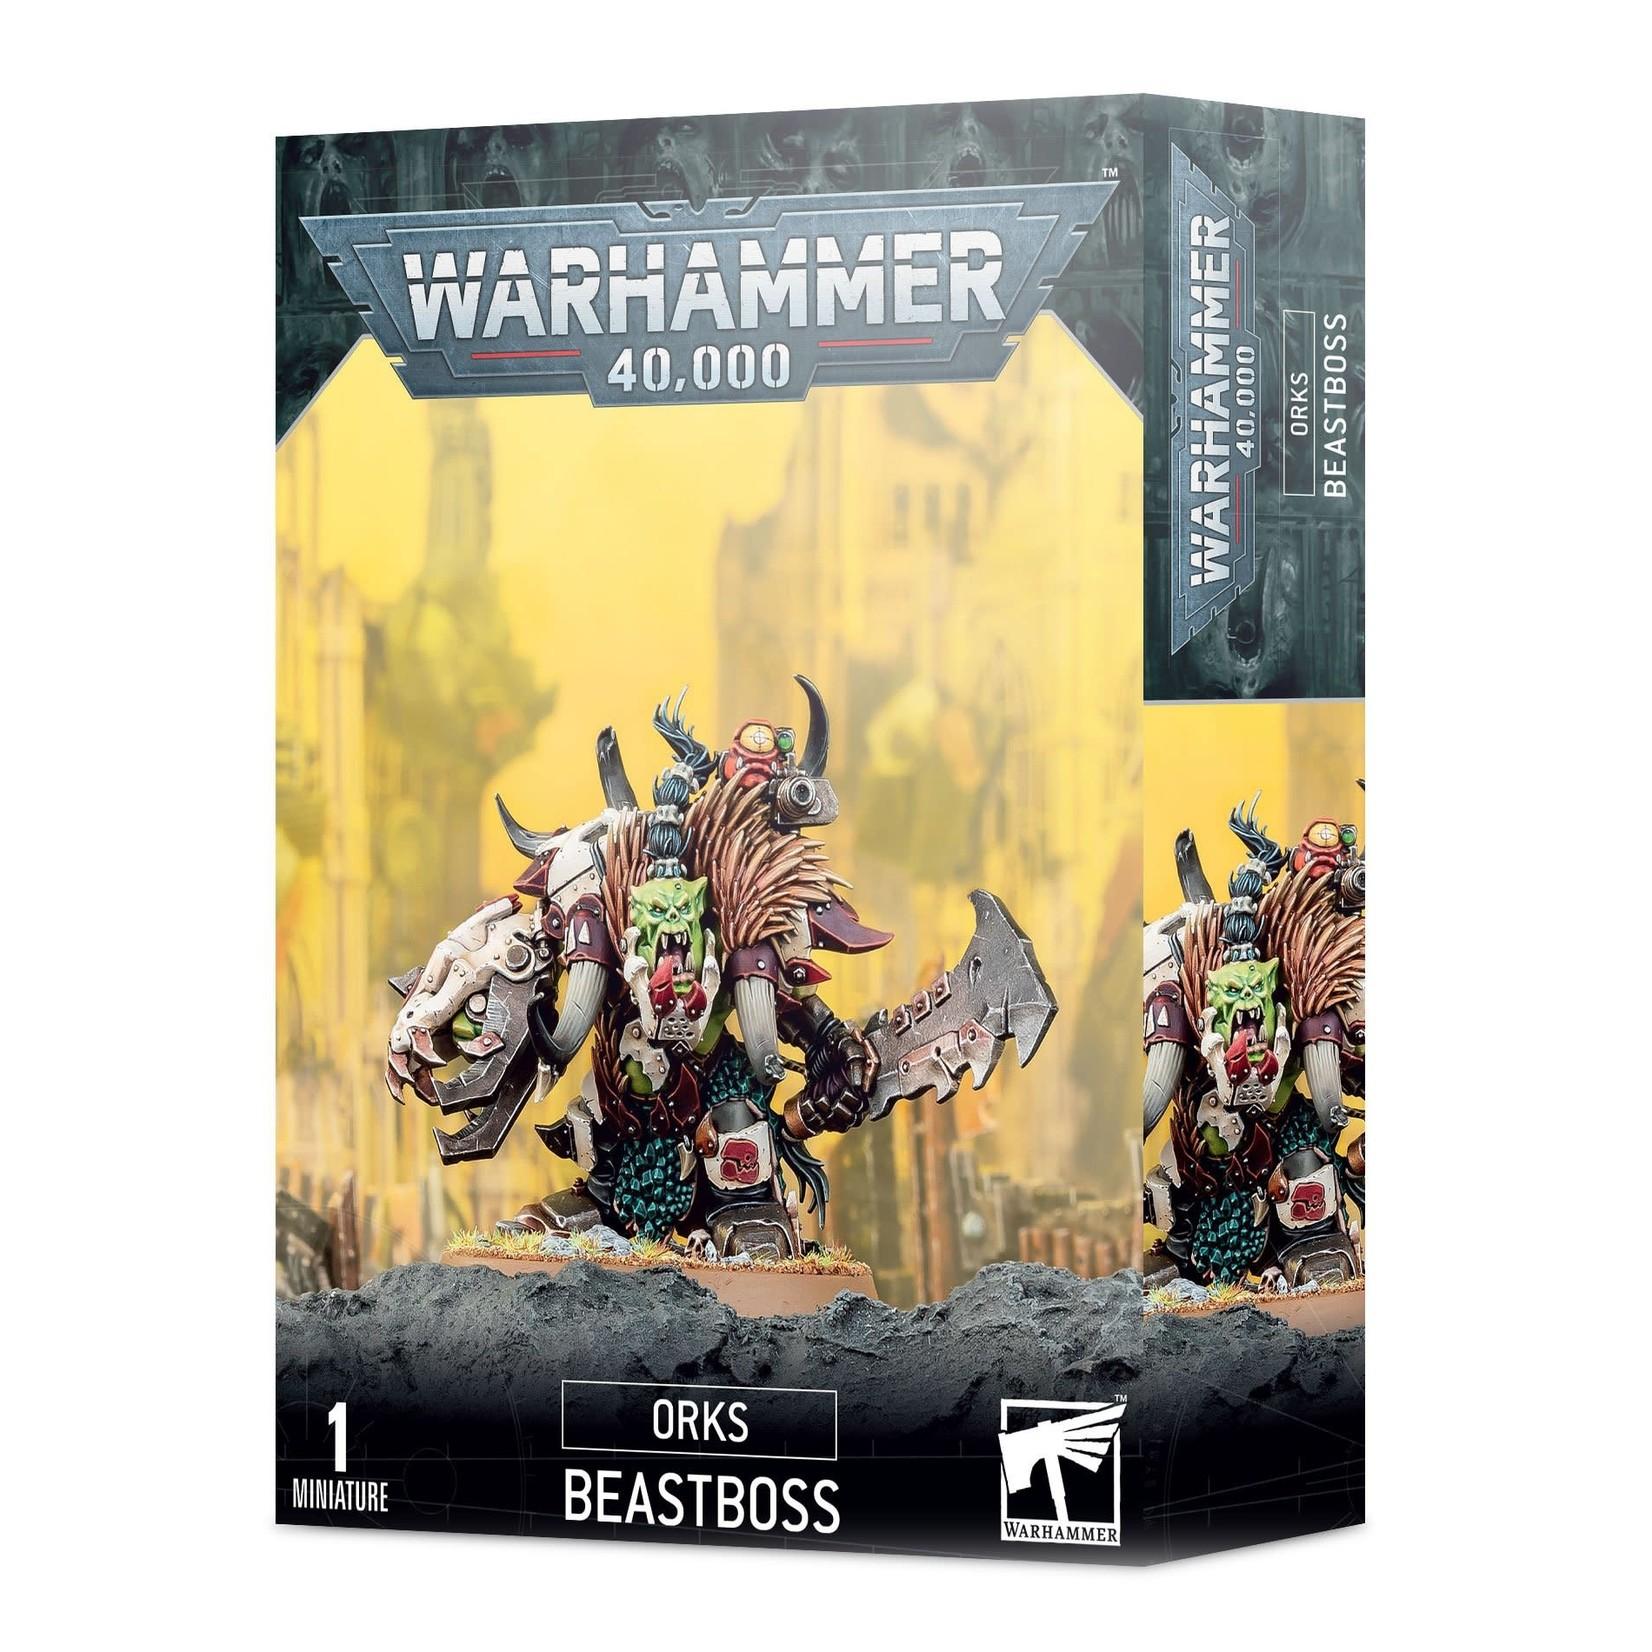 Games Workshop Warhammer 40k: Orks - Beastboss